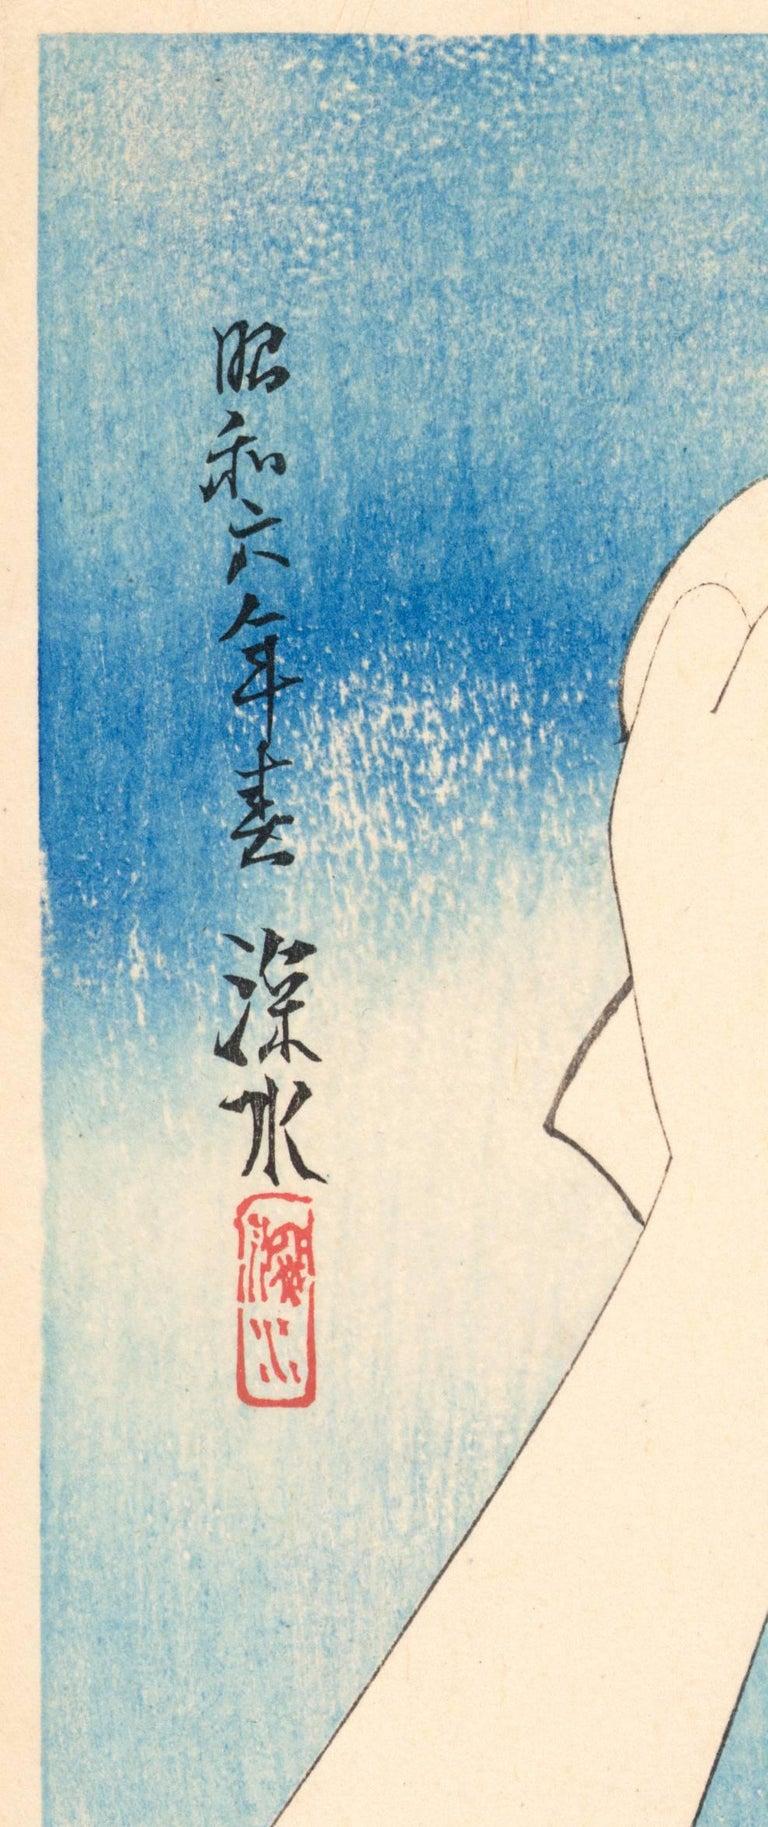 Beauty Covering Her Hair (Gathering Shellfish: Shiohigari) - Showa Print by Ito Shinsui